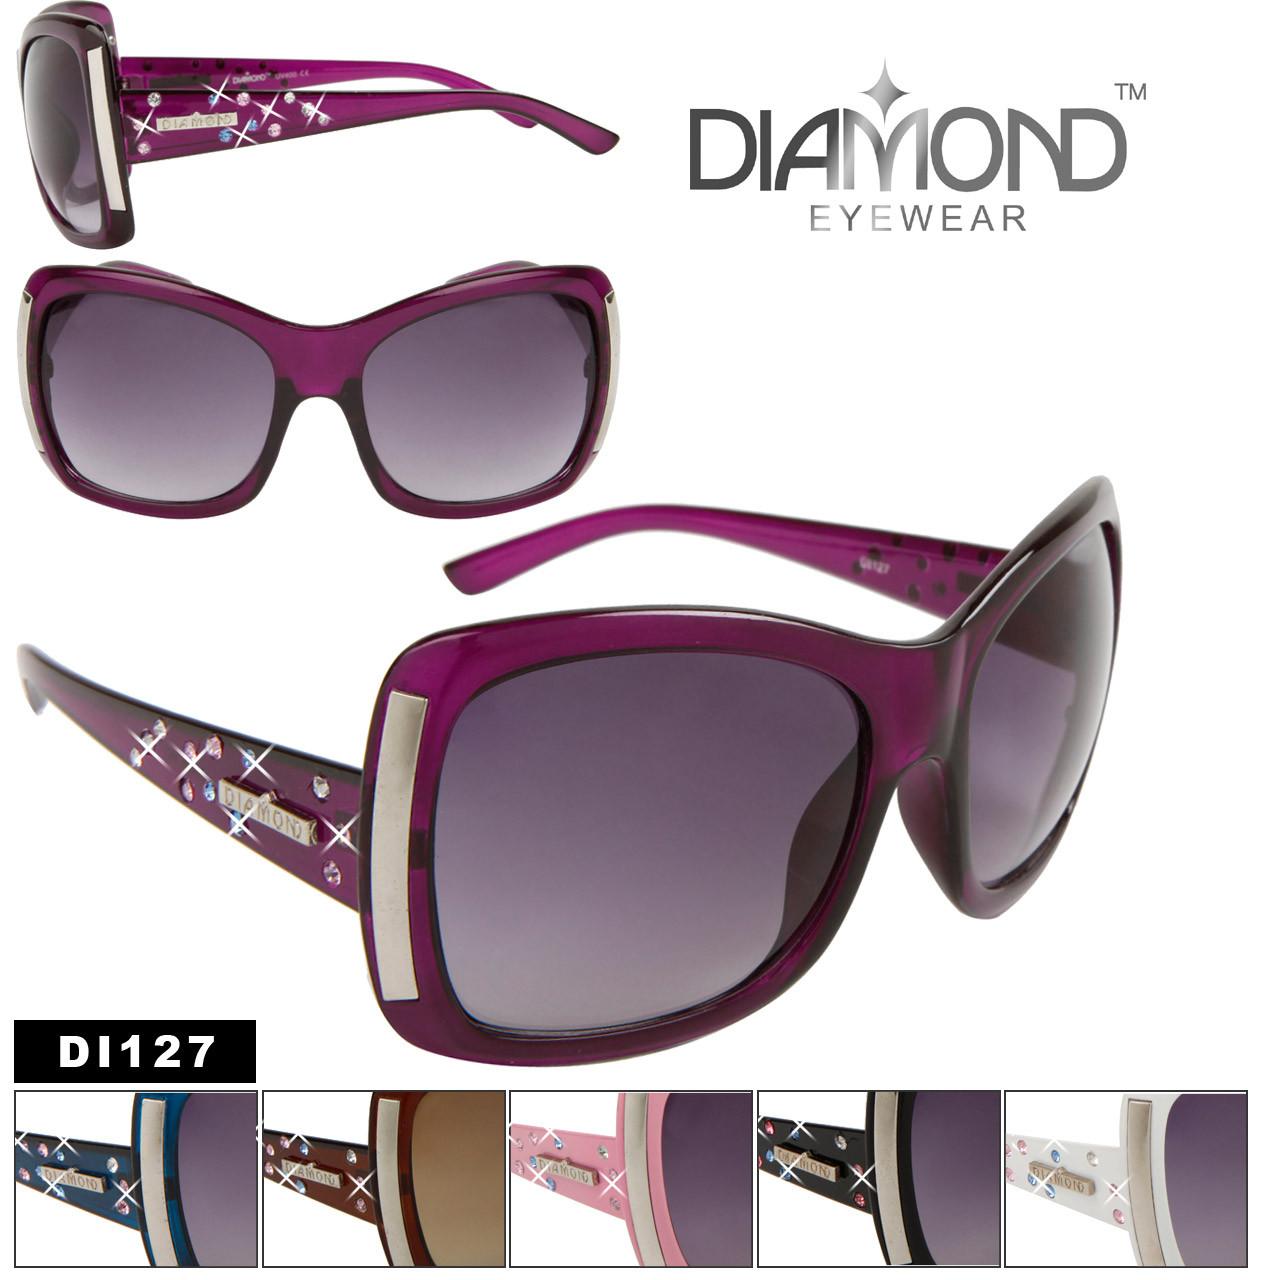 Wholesale Sunglasses with Rhinestones